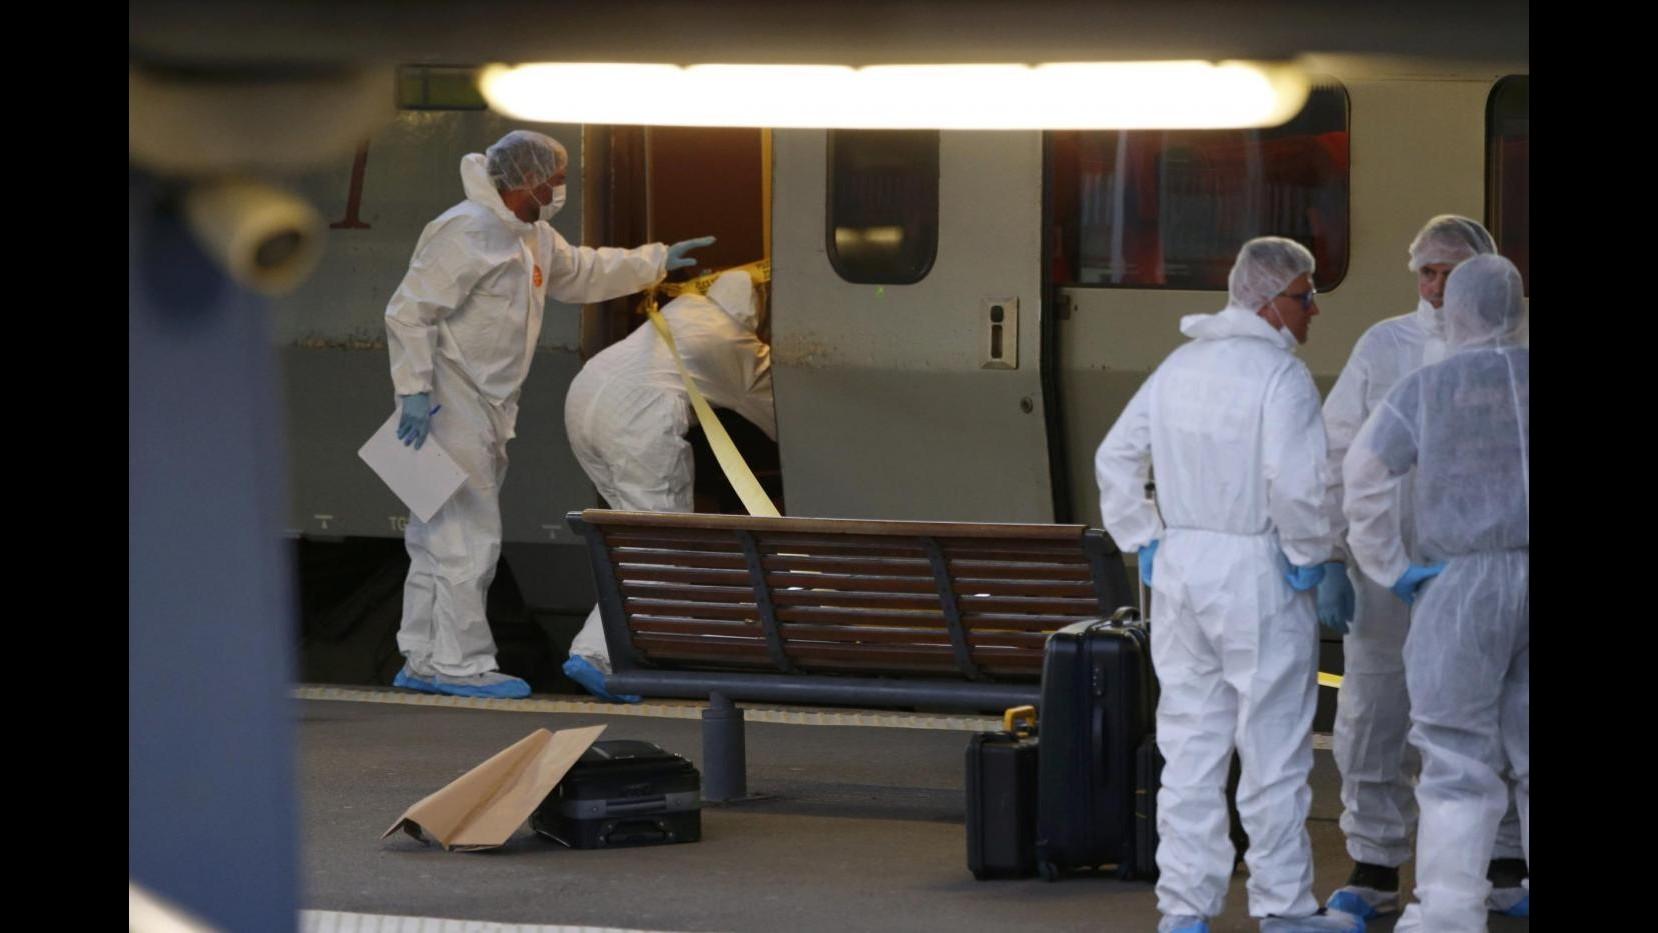 Sparatoria treno, media: Autore faceva parte di cellula Verviers